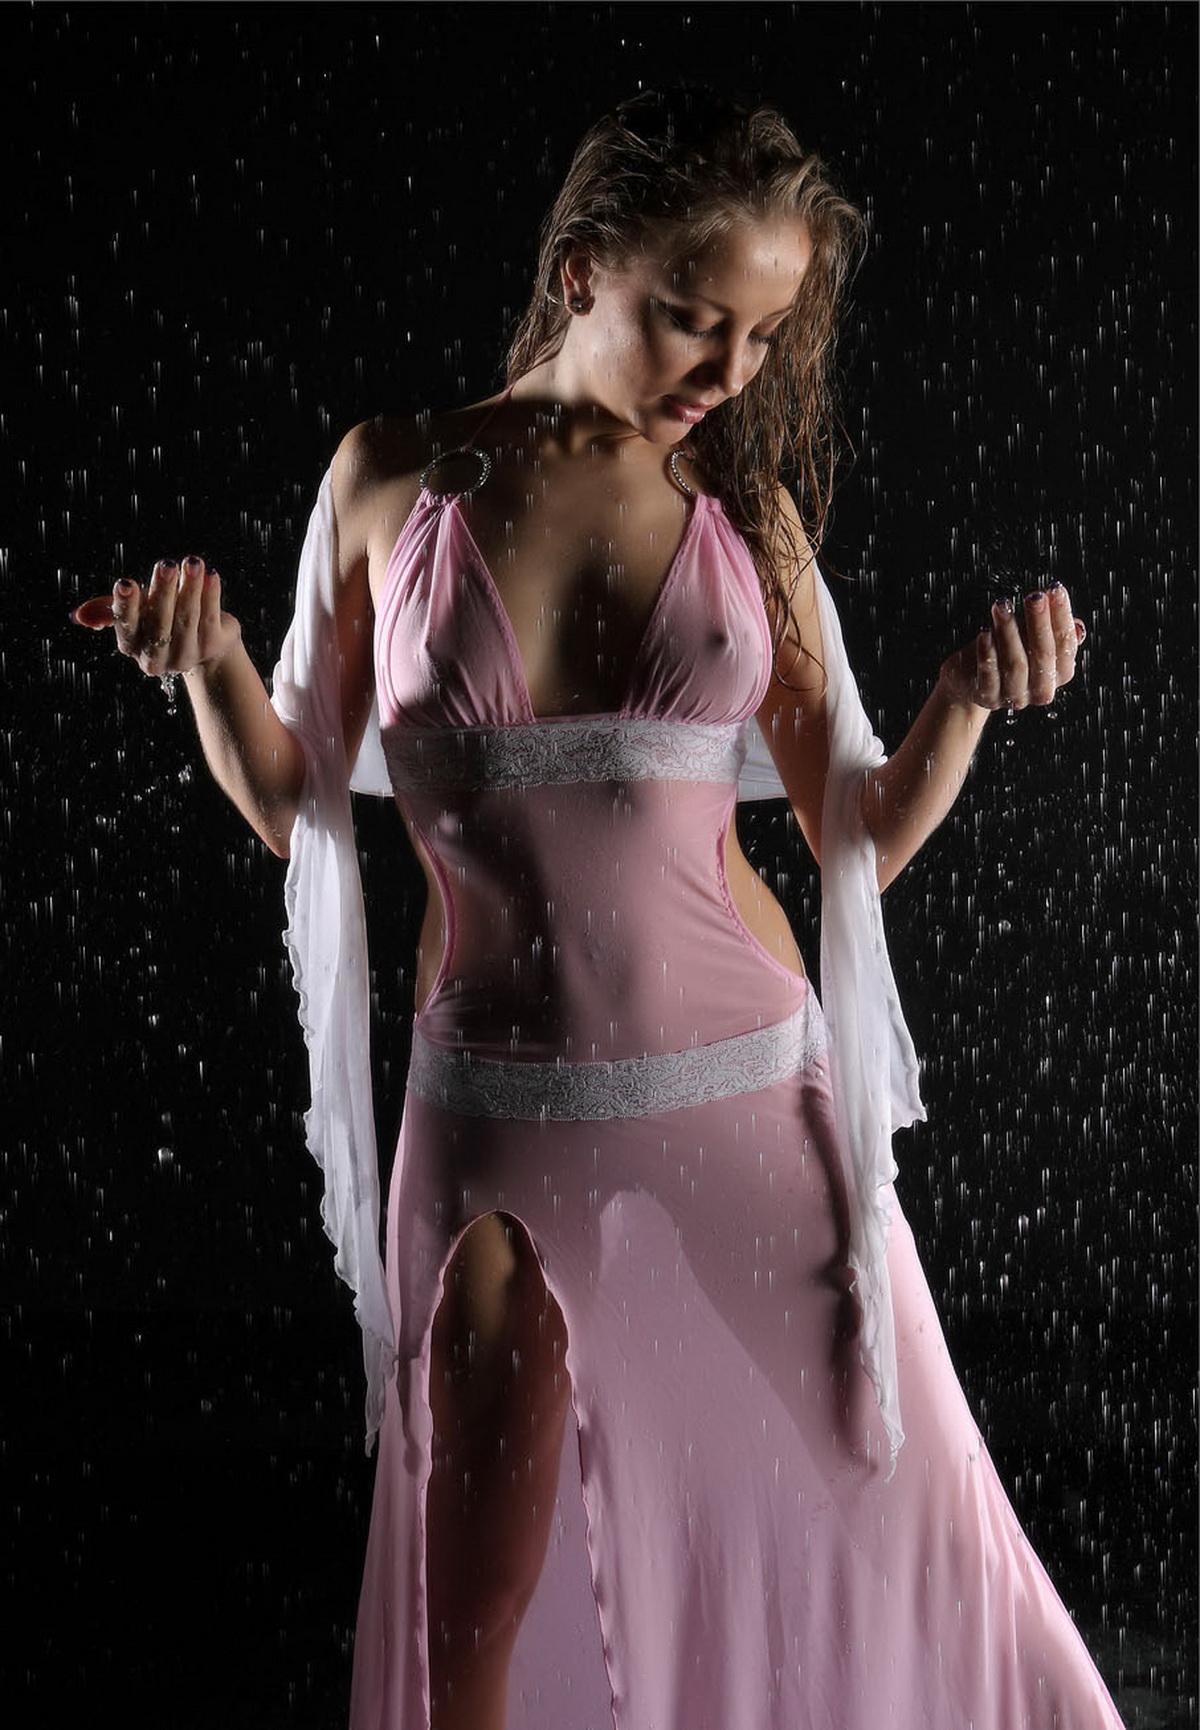 Эротика под дождем (19 фото)